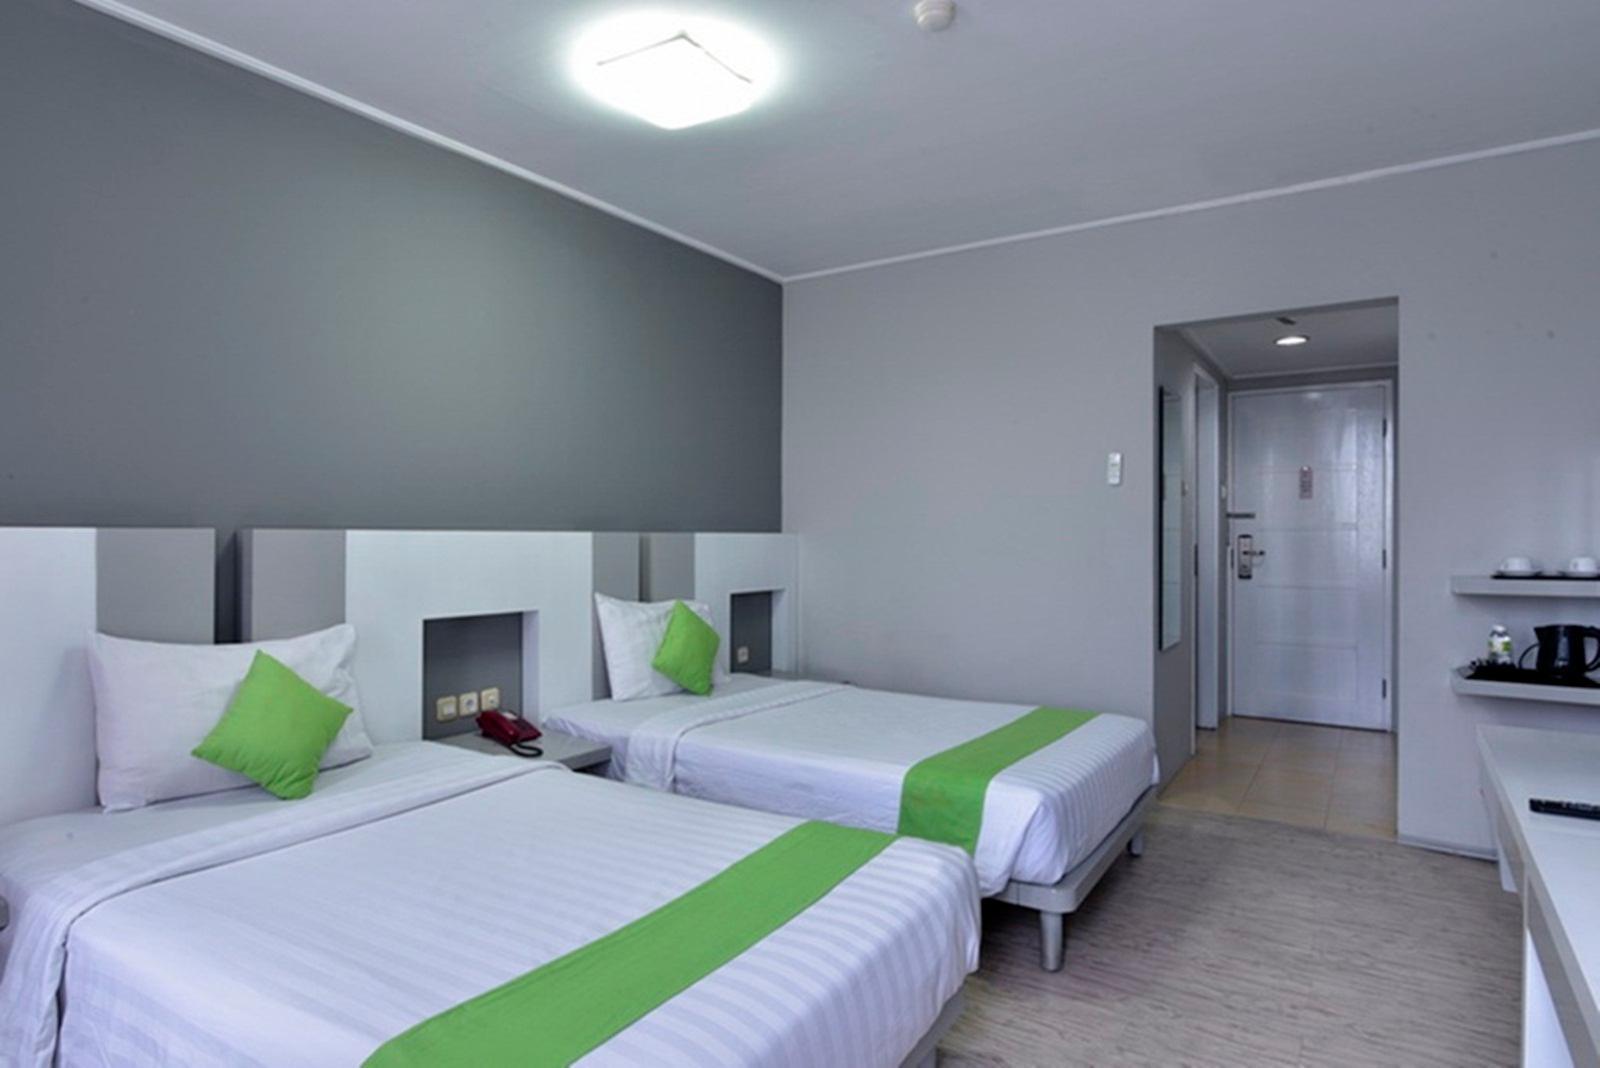 grand nanggroe hotel in aceh room deals photos reviews rh agoda com hotel grand nanggroe di aceh hotel grand nanggroe di aceh